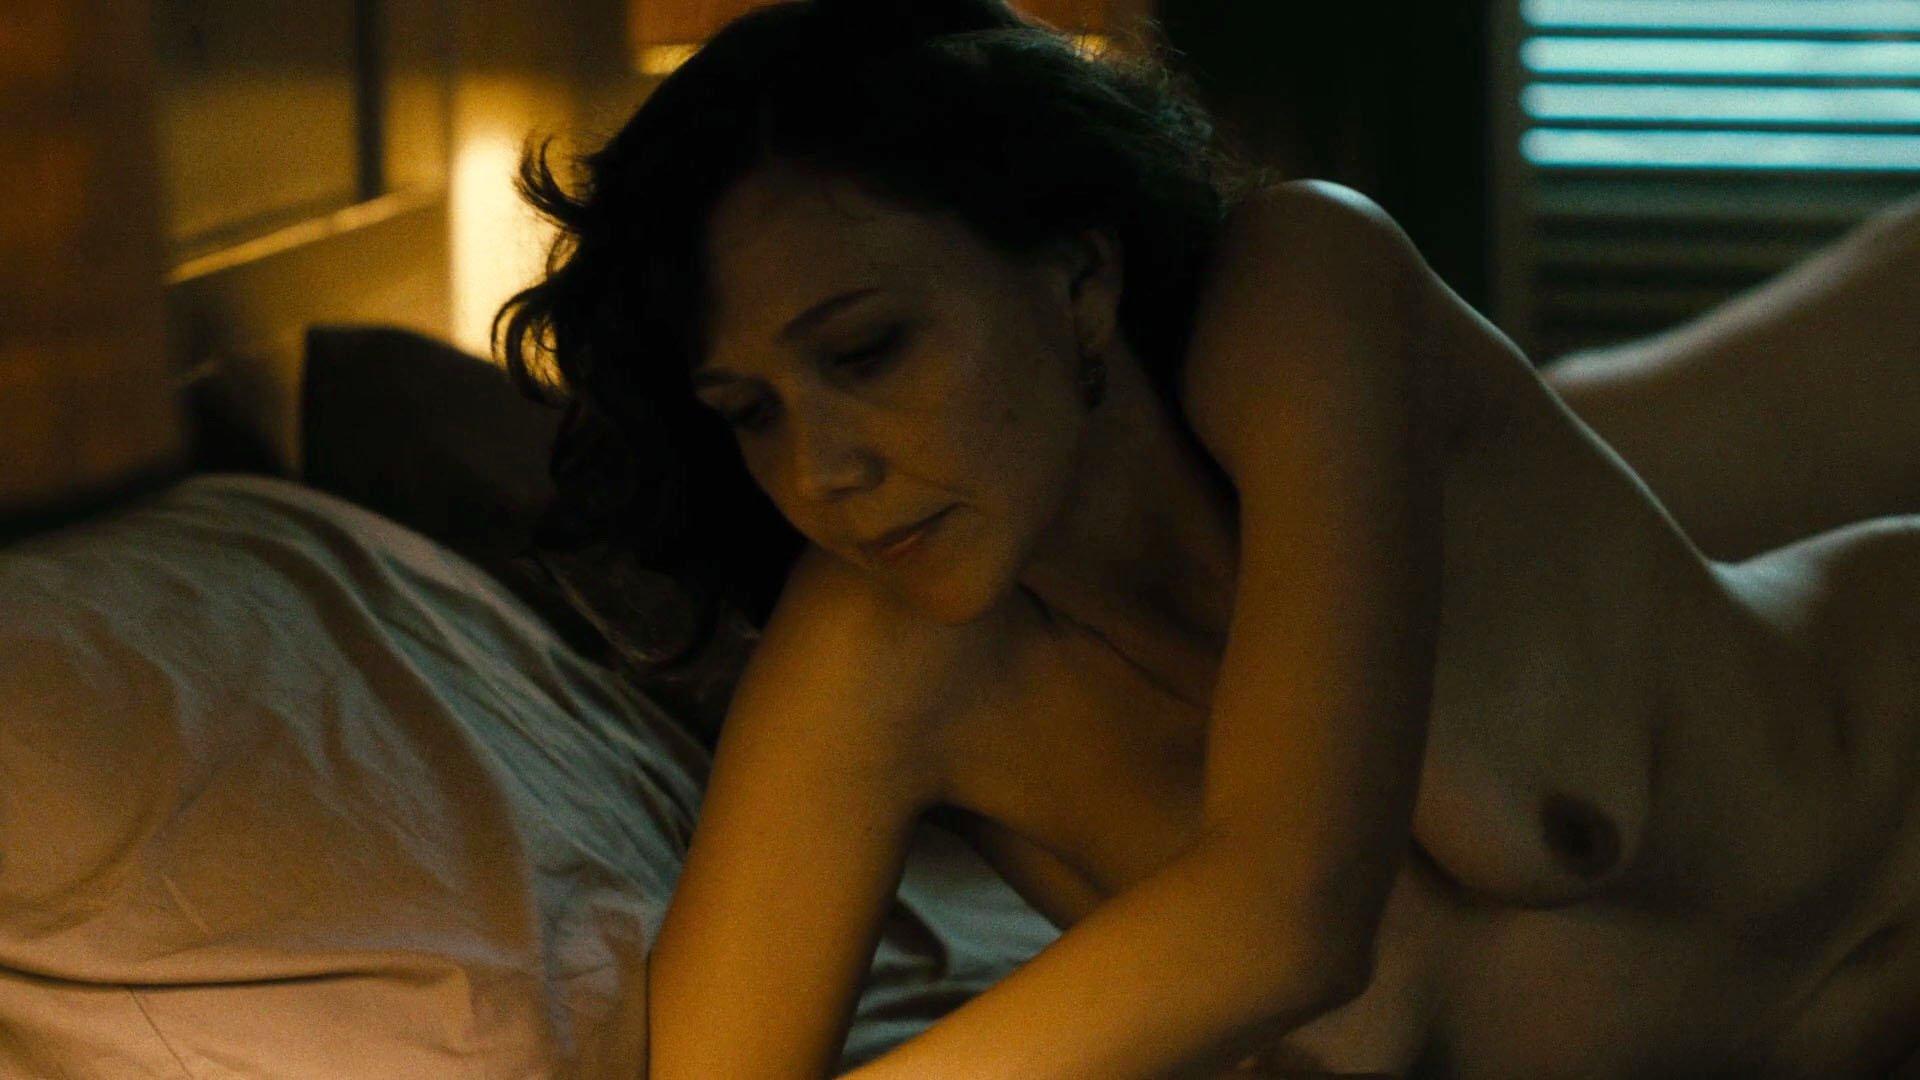 Kerry washington topless sex scene mampc - 1 part 2